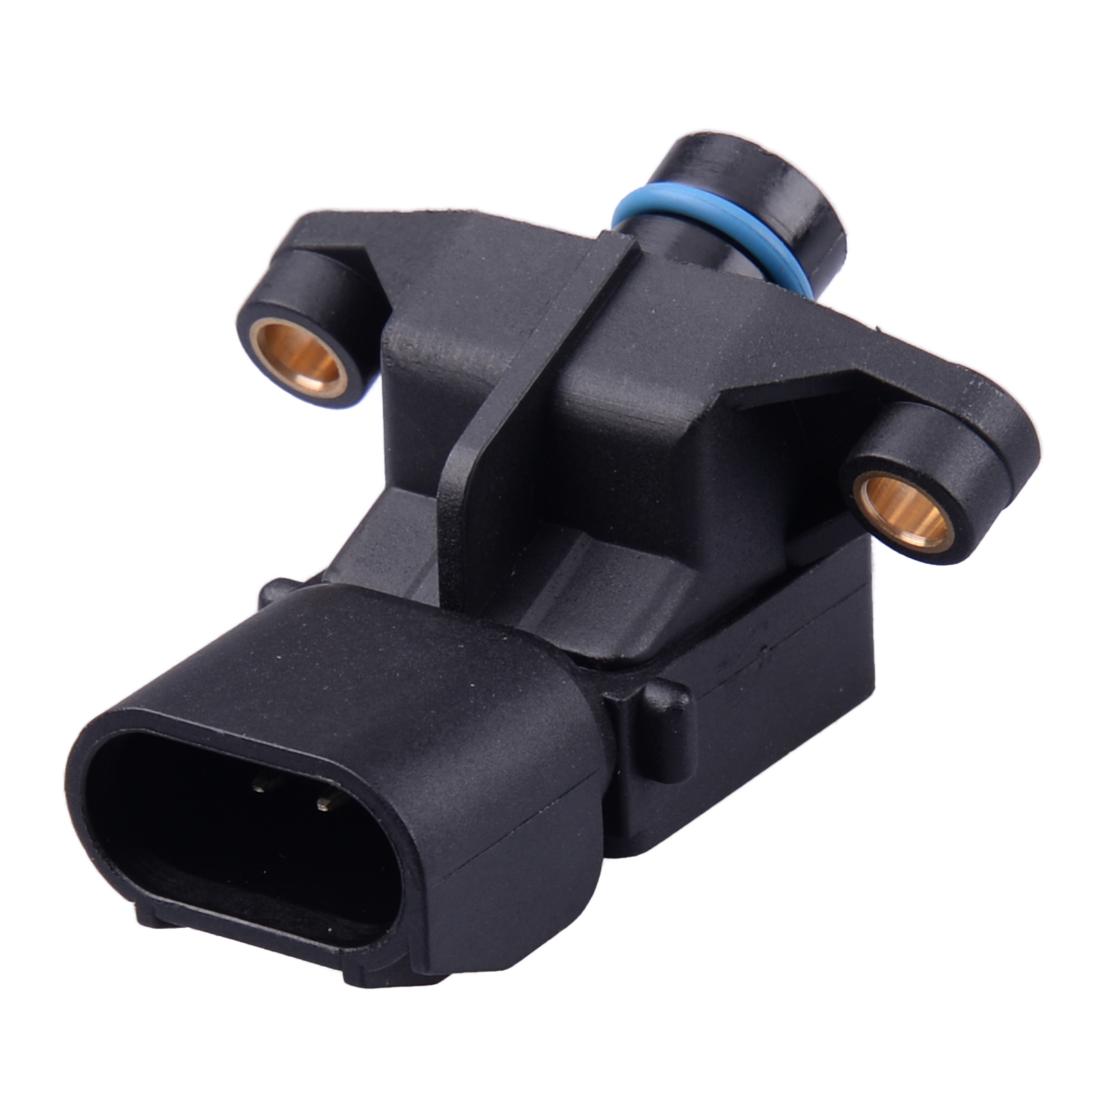 Intake Air Pressure Sensor MAP Sensor for Dodge, Chrysler OE:4686684AA/4686684AB